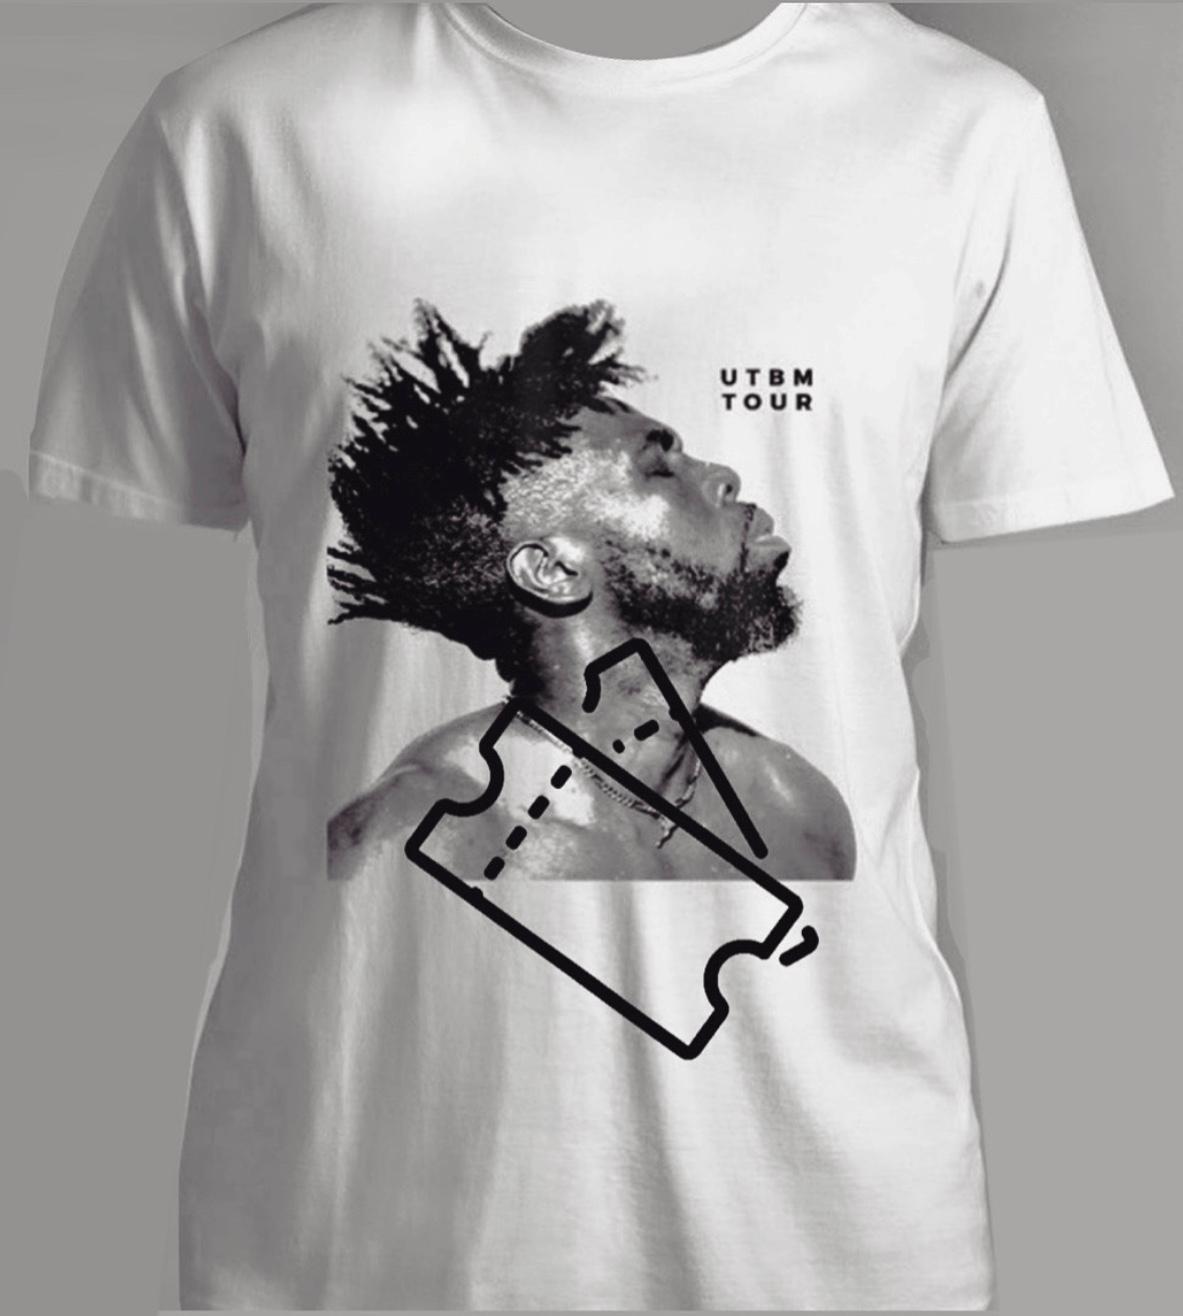 T-Shirt and Ticket Bundle - Joel Culpepper